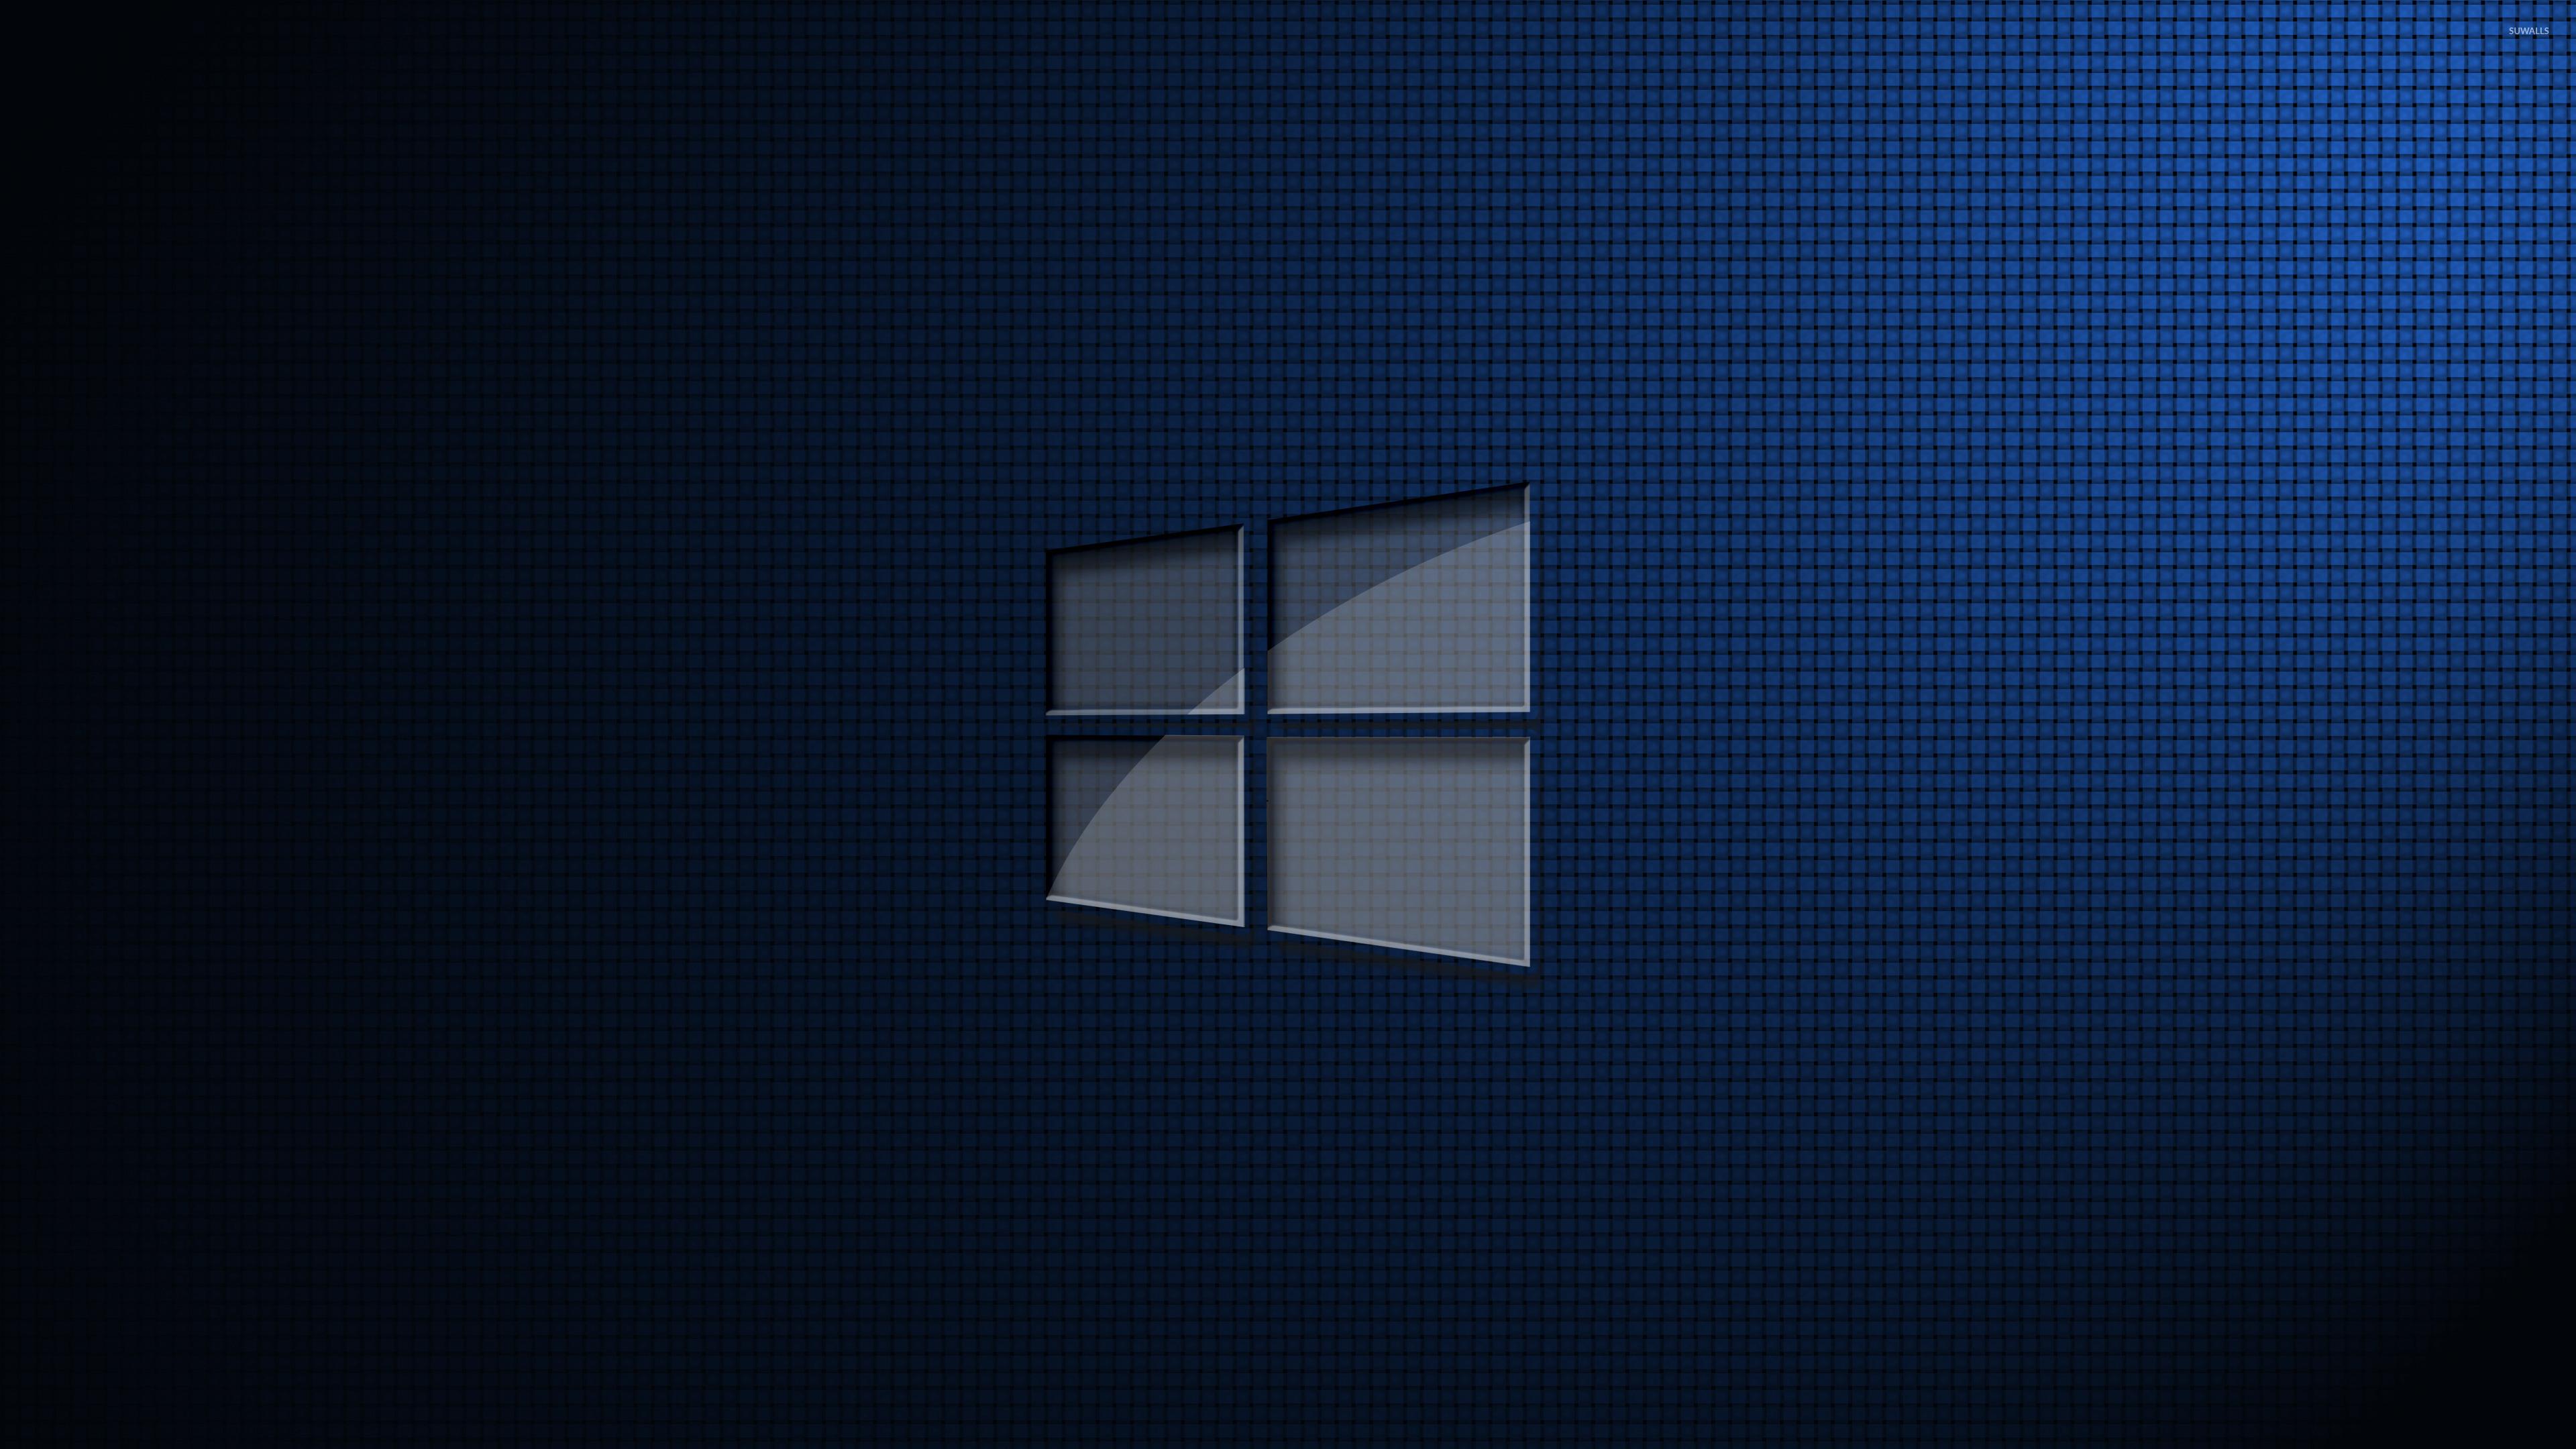 Glass Windows 10 Wallpaper : Glass windows on square pattern wallpaper computer